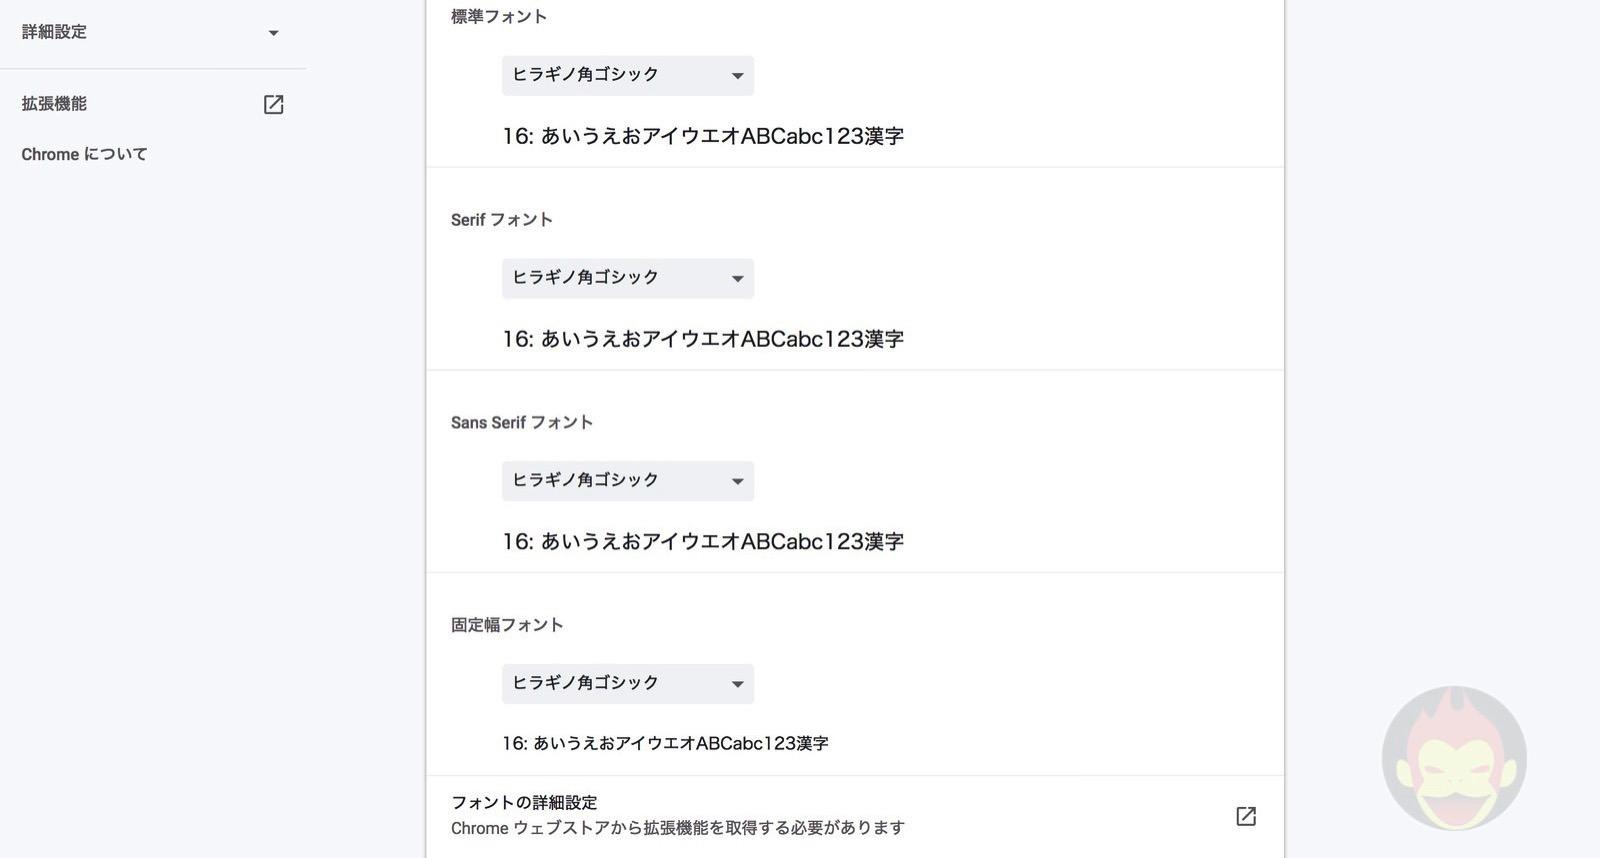 Chrome-Fonts-01.jpg